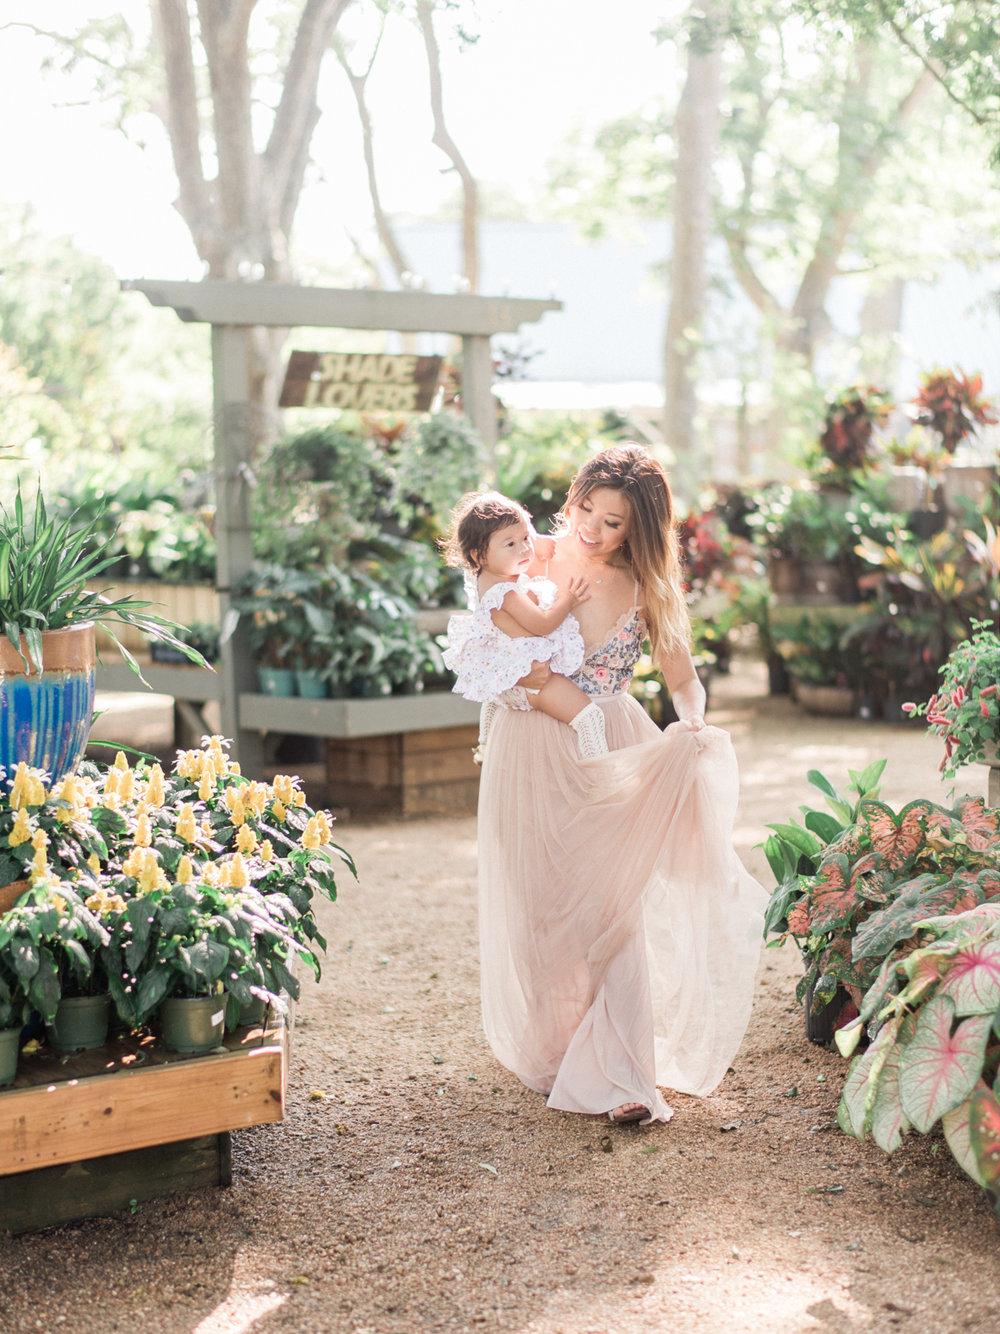 Divya Pande Photography Mother Daughter Nursery-22.jpg